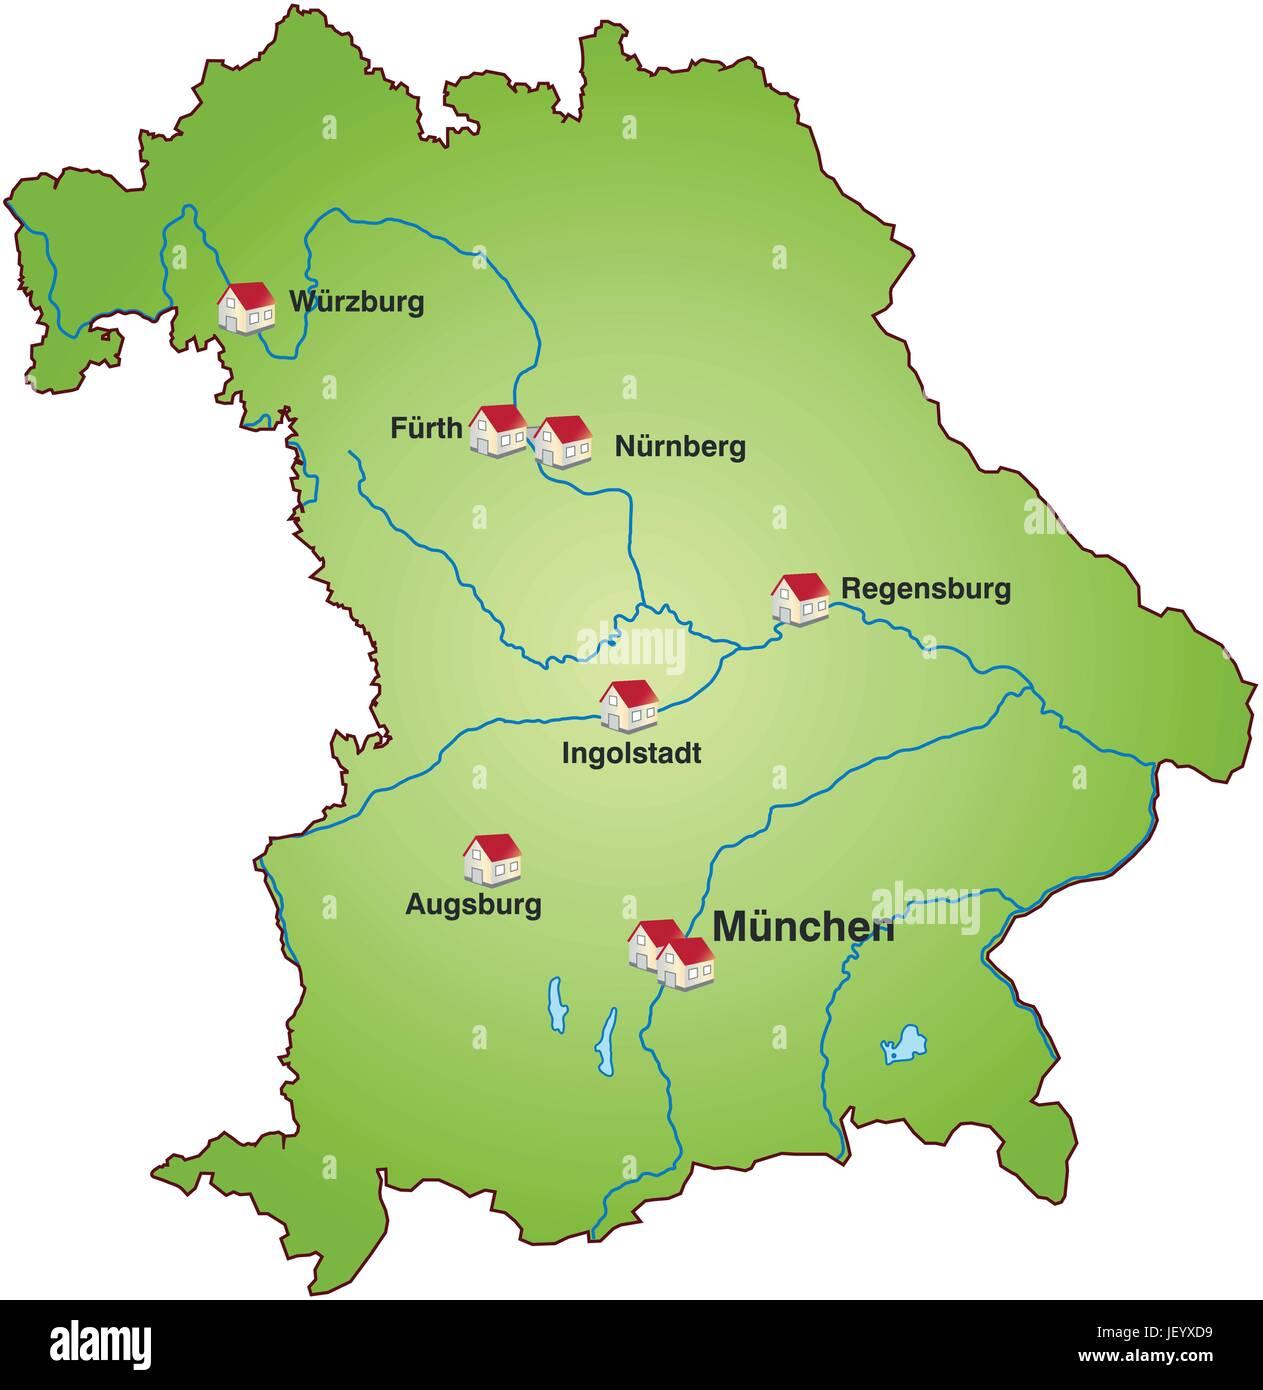 Bayern Karte.Bayern Staat Atlas Karte Karte Der Welt Karte Bayern